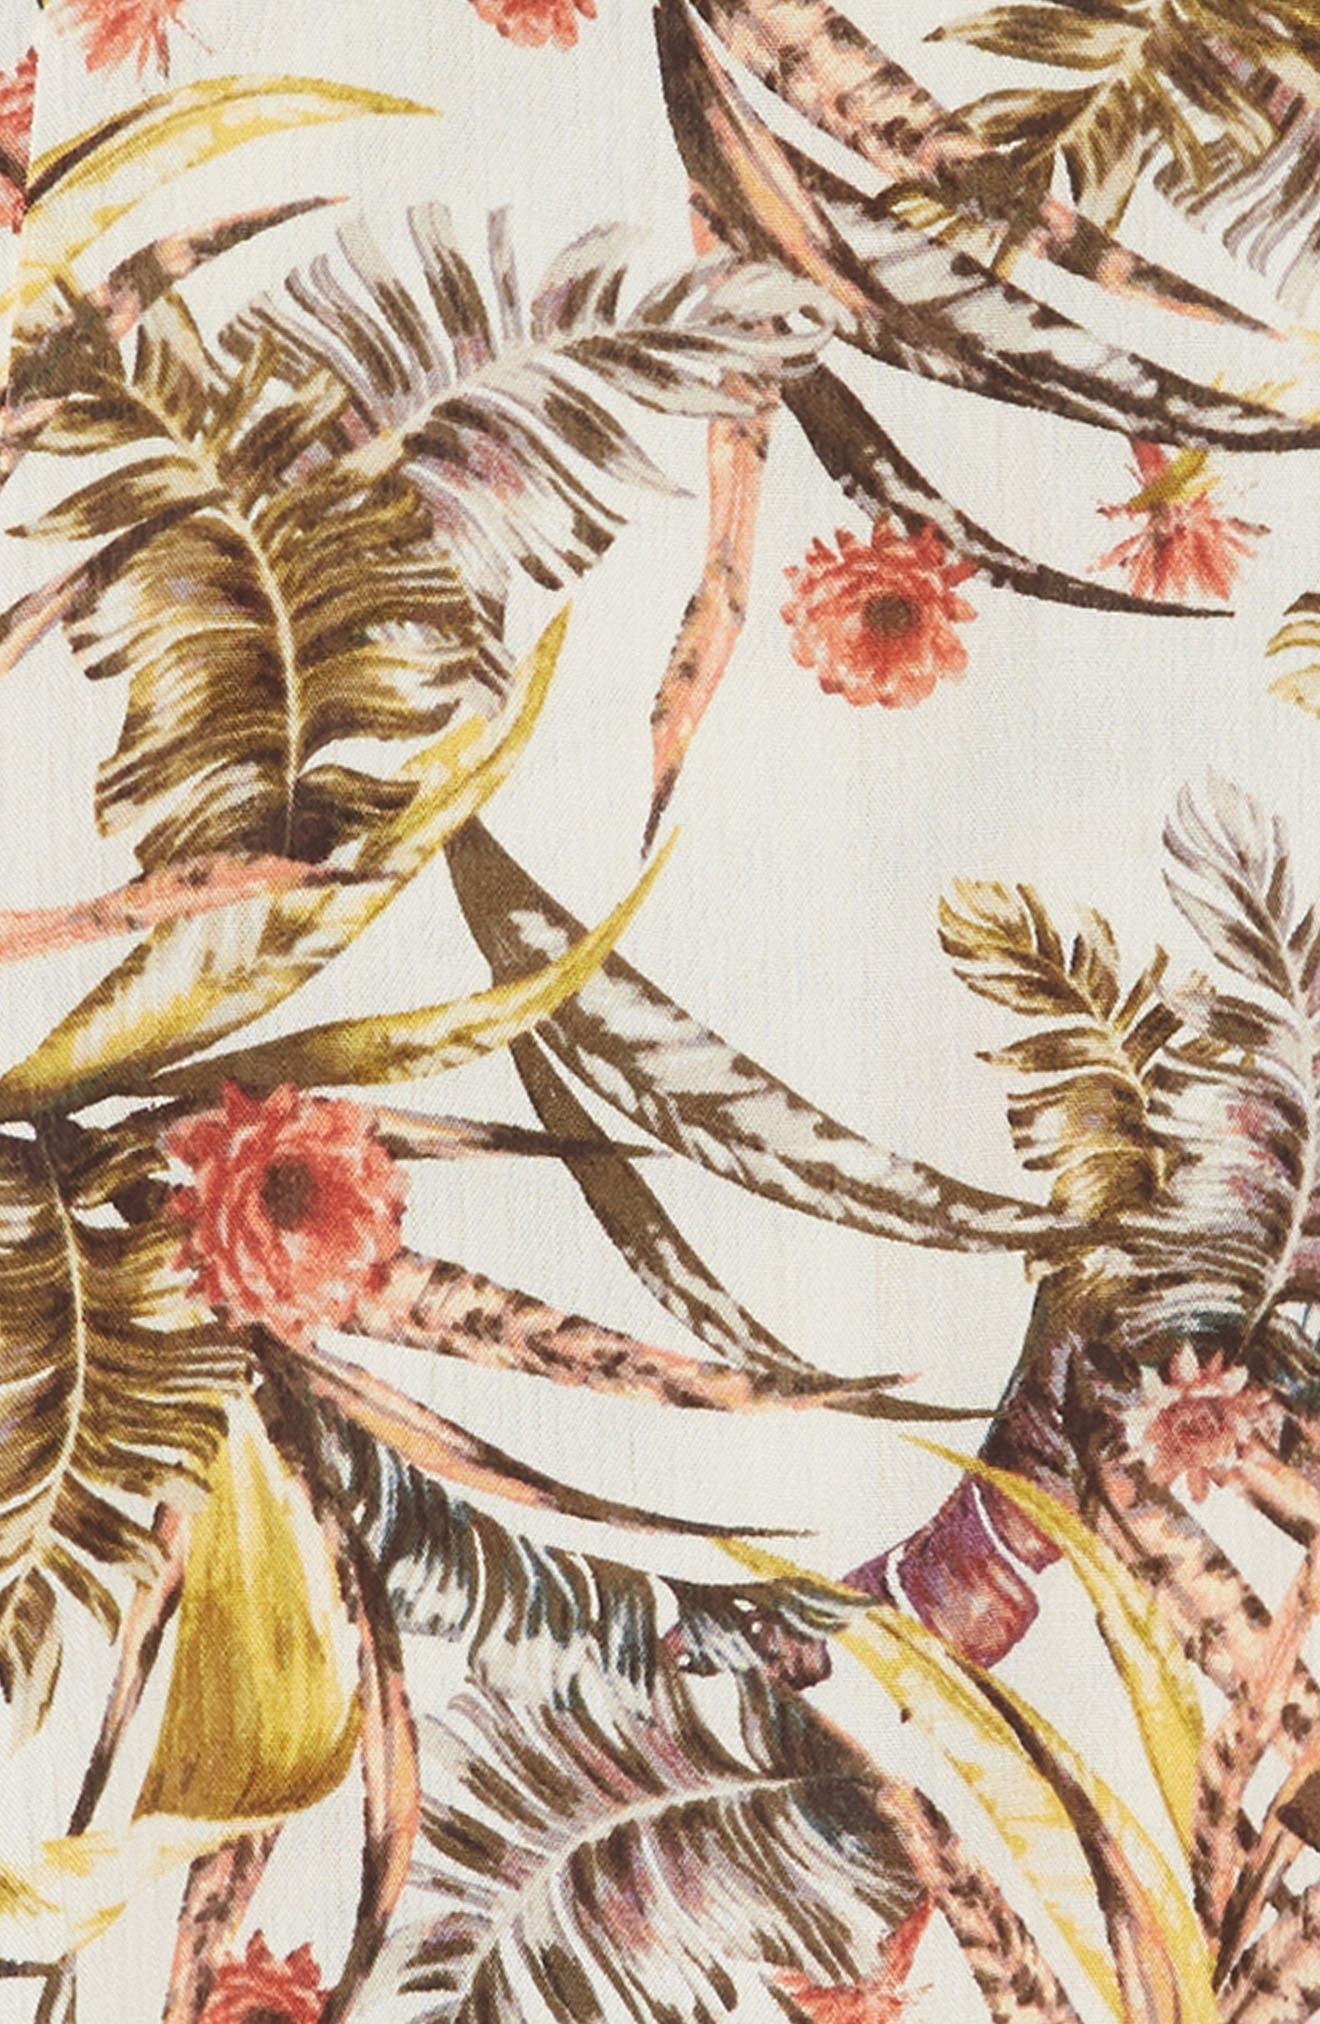 Dreamer Tropical Print Dress,                             Alternate thumbnail 3, color,                             250